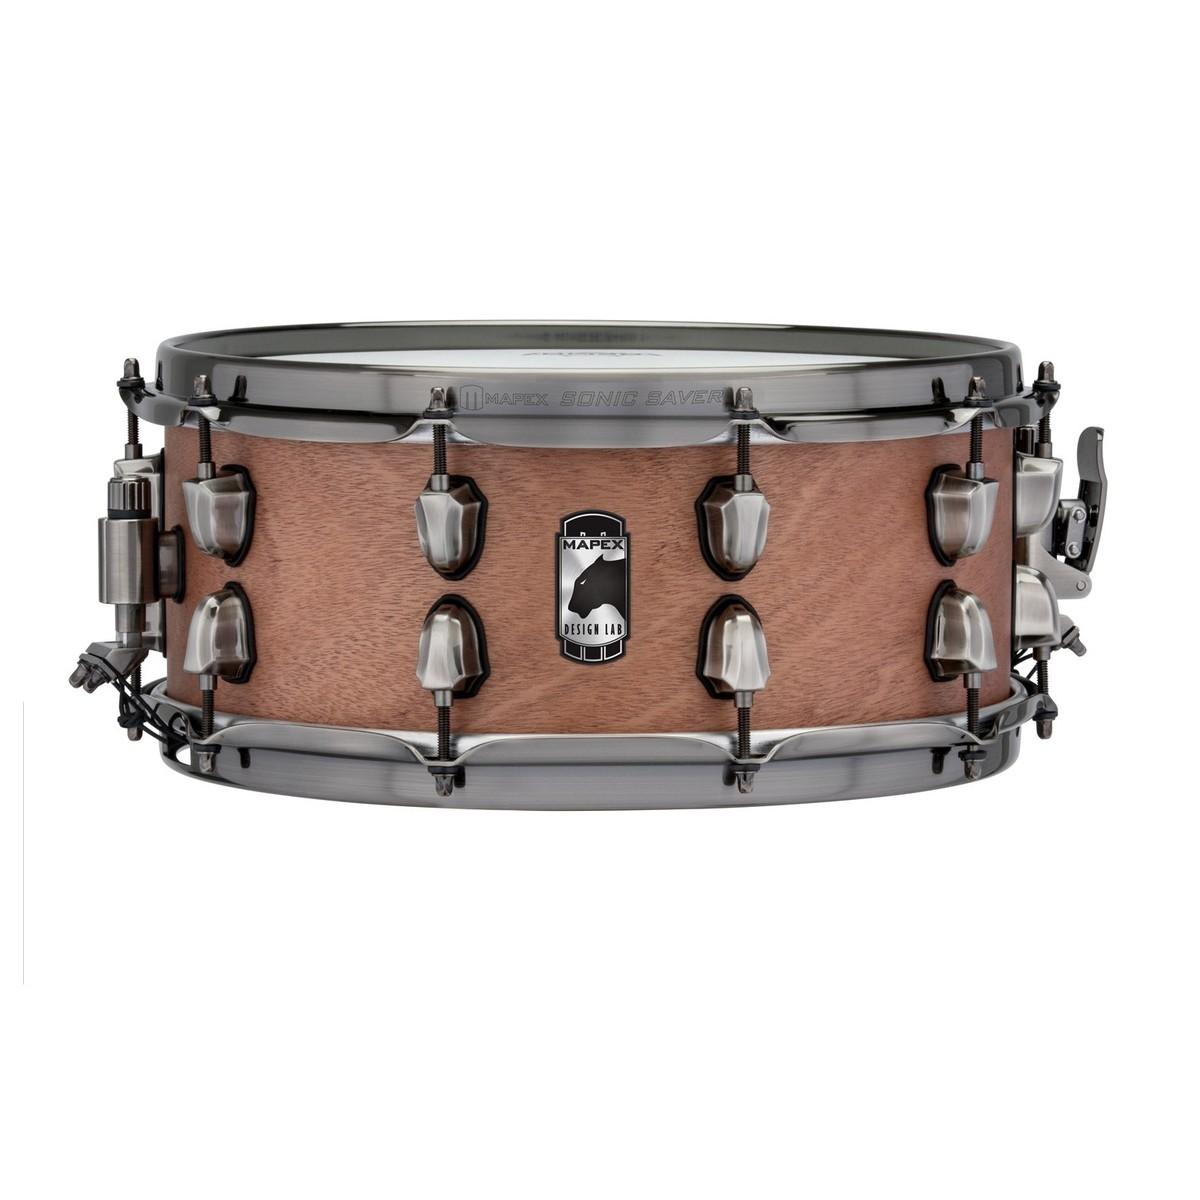 mapex black panther design lab heartbreaker 14 39 39 x 6 39 39 snare drum at gear4music. Black Bedroom Furniture Sets. Home Design Ideas